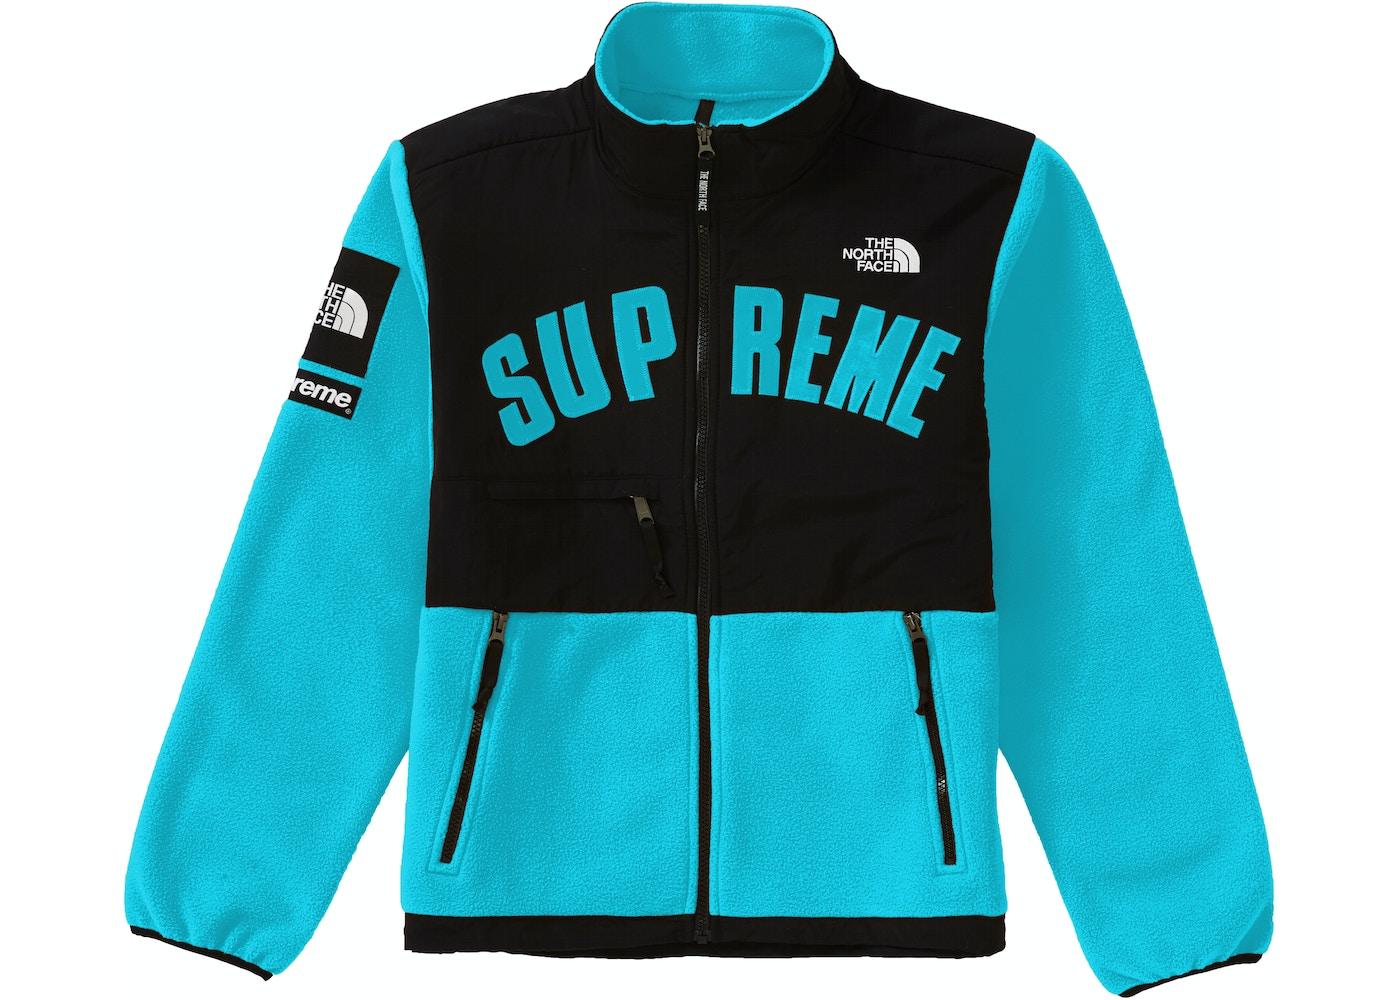 faa38b459 Supreme Jackets - Buy & Sell Streetwear